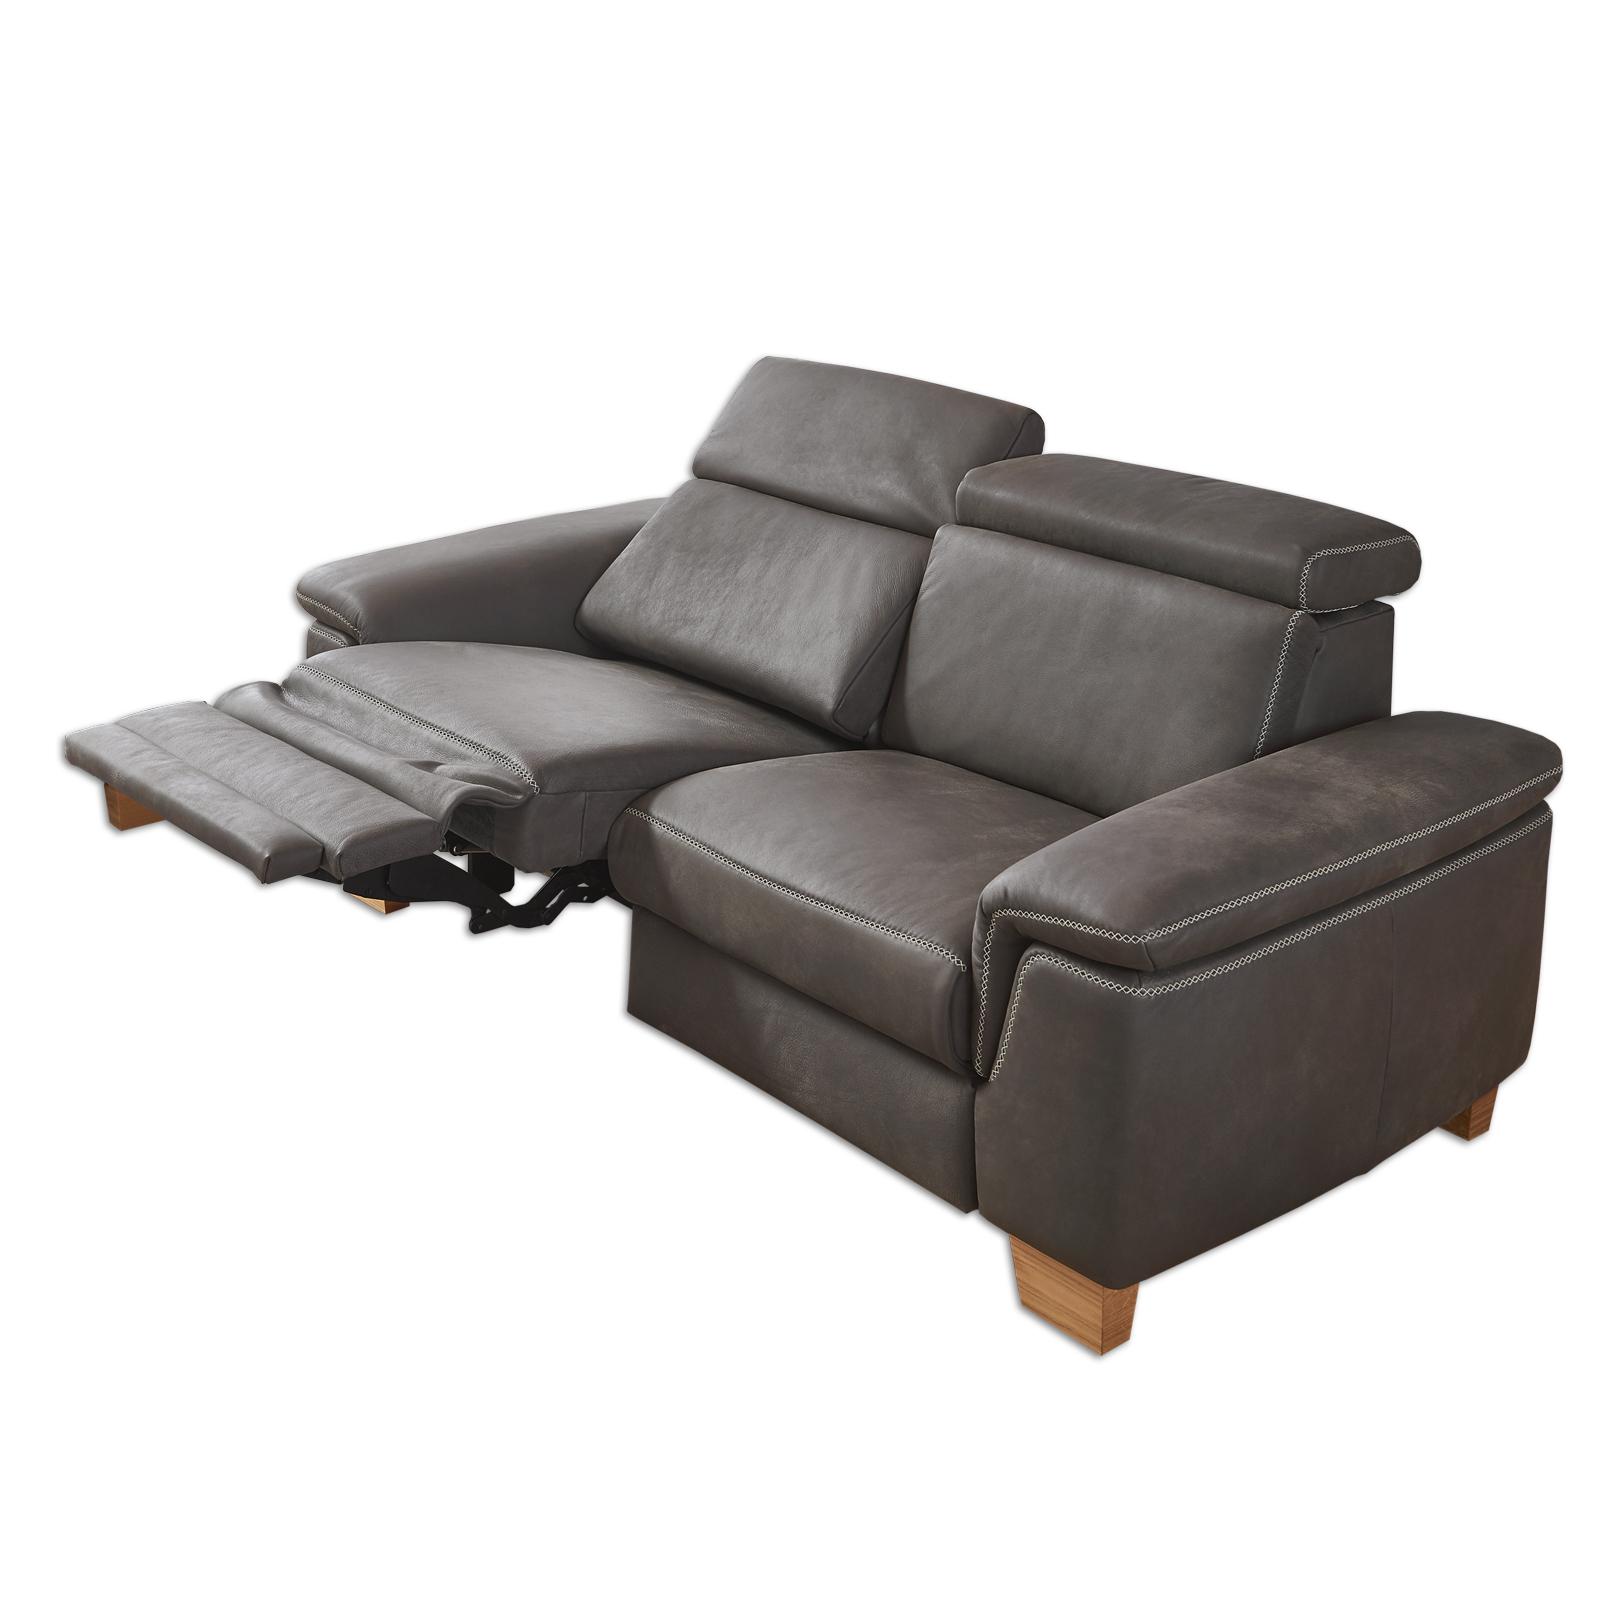 Full Size of 2 Sitzer Sofa Mit Relaxfunktion Stressless 5 Leder 2 Sitzer City Stoff Couch Polsterpower Spiegelschrank Bad Beleuchtung Und Steckdose Megapol 2er Hersteller Sofa 2 Sitzer Sofa Mit Relaxfunktion